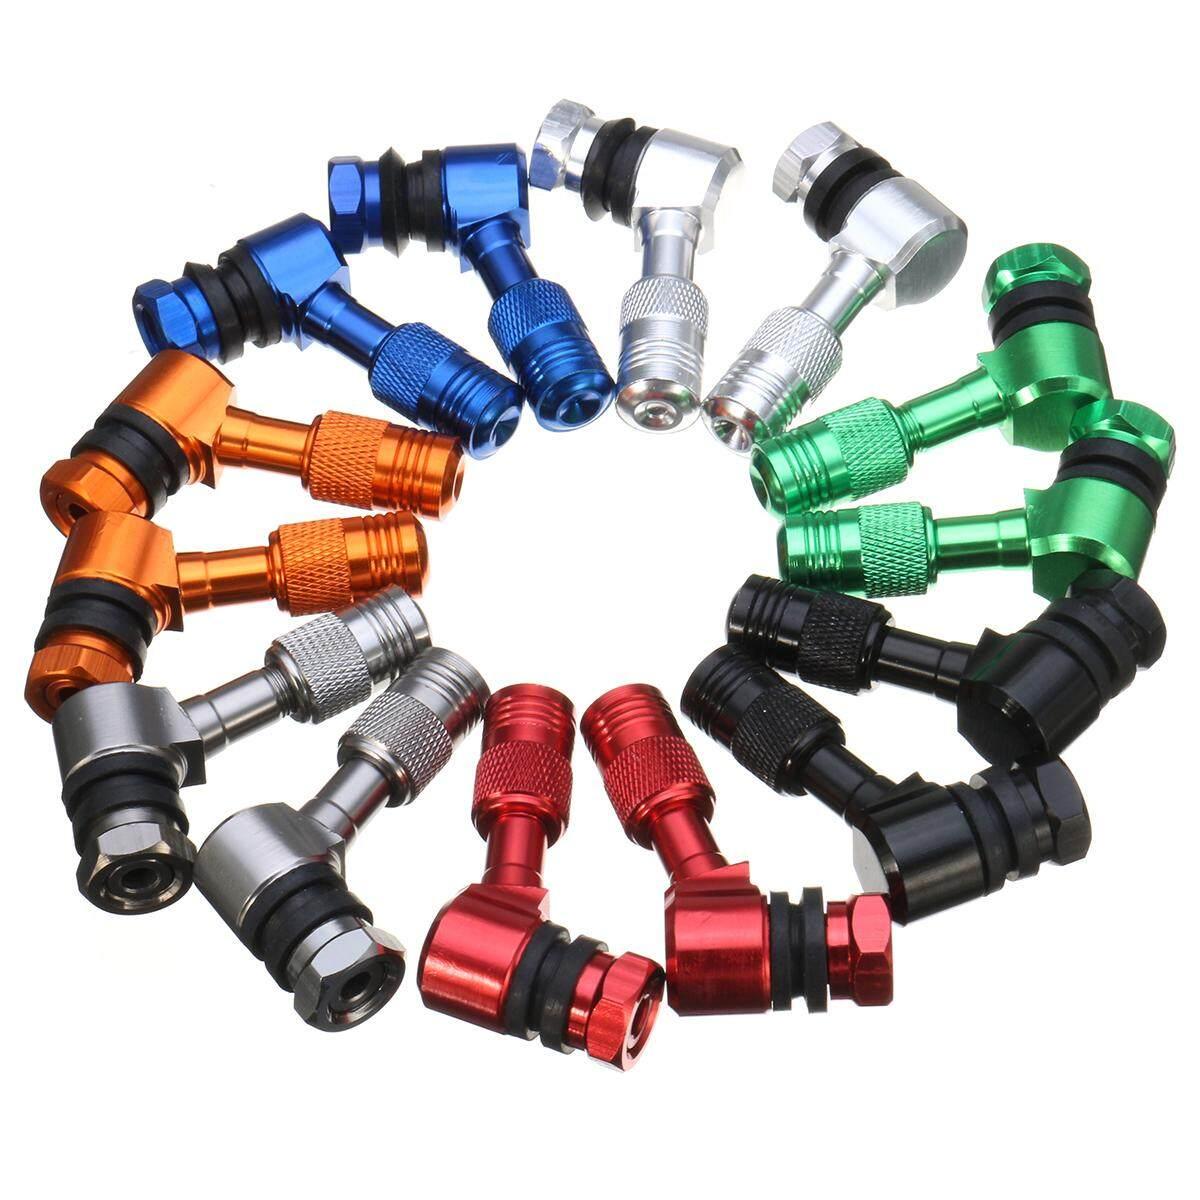 Roda Tire Katup Batang untuk Honda CB CBR NSR VTR 125 250 400 600 900 1000 11.3 Mm (Ungu) -Internasional